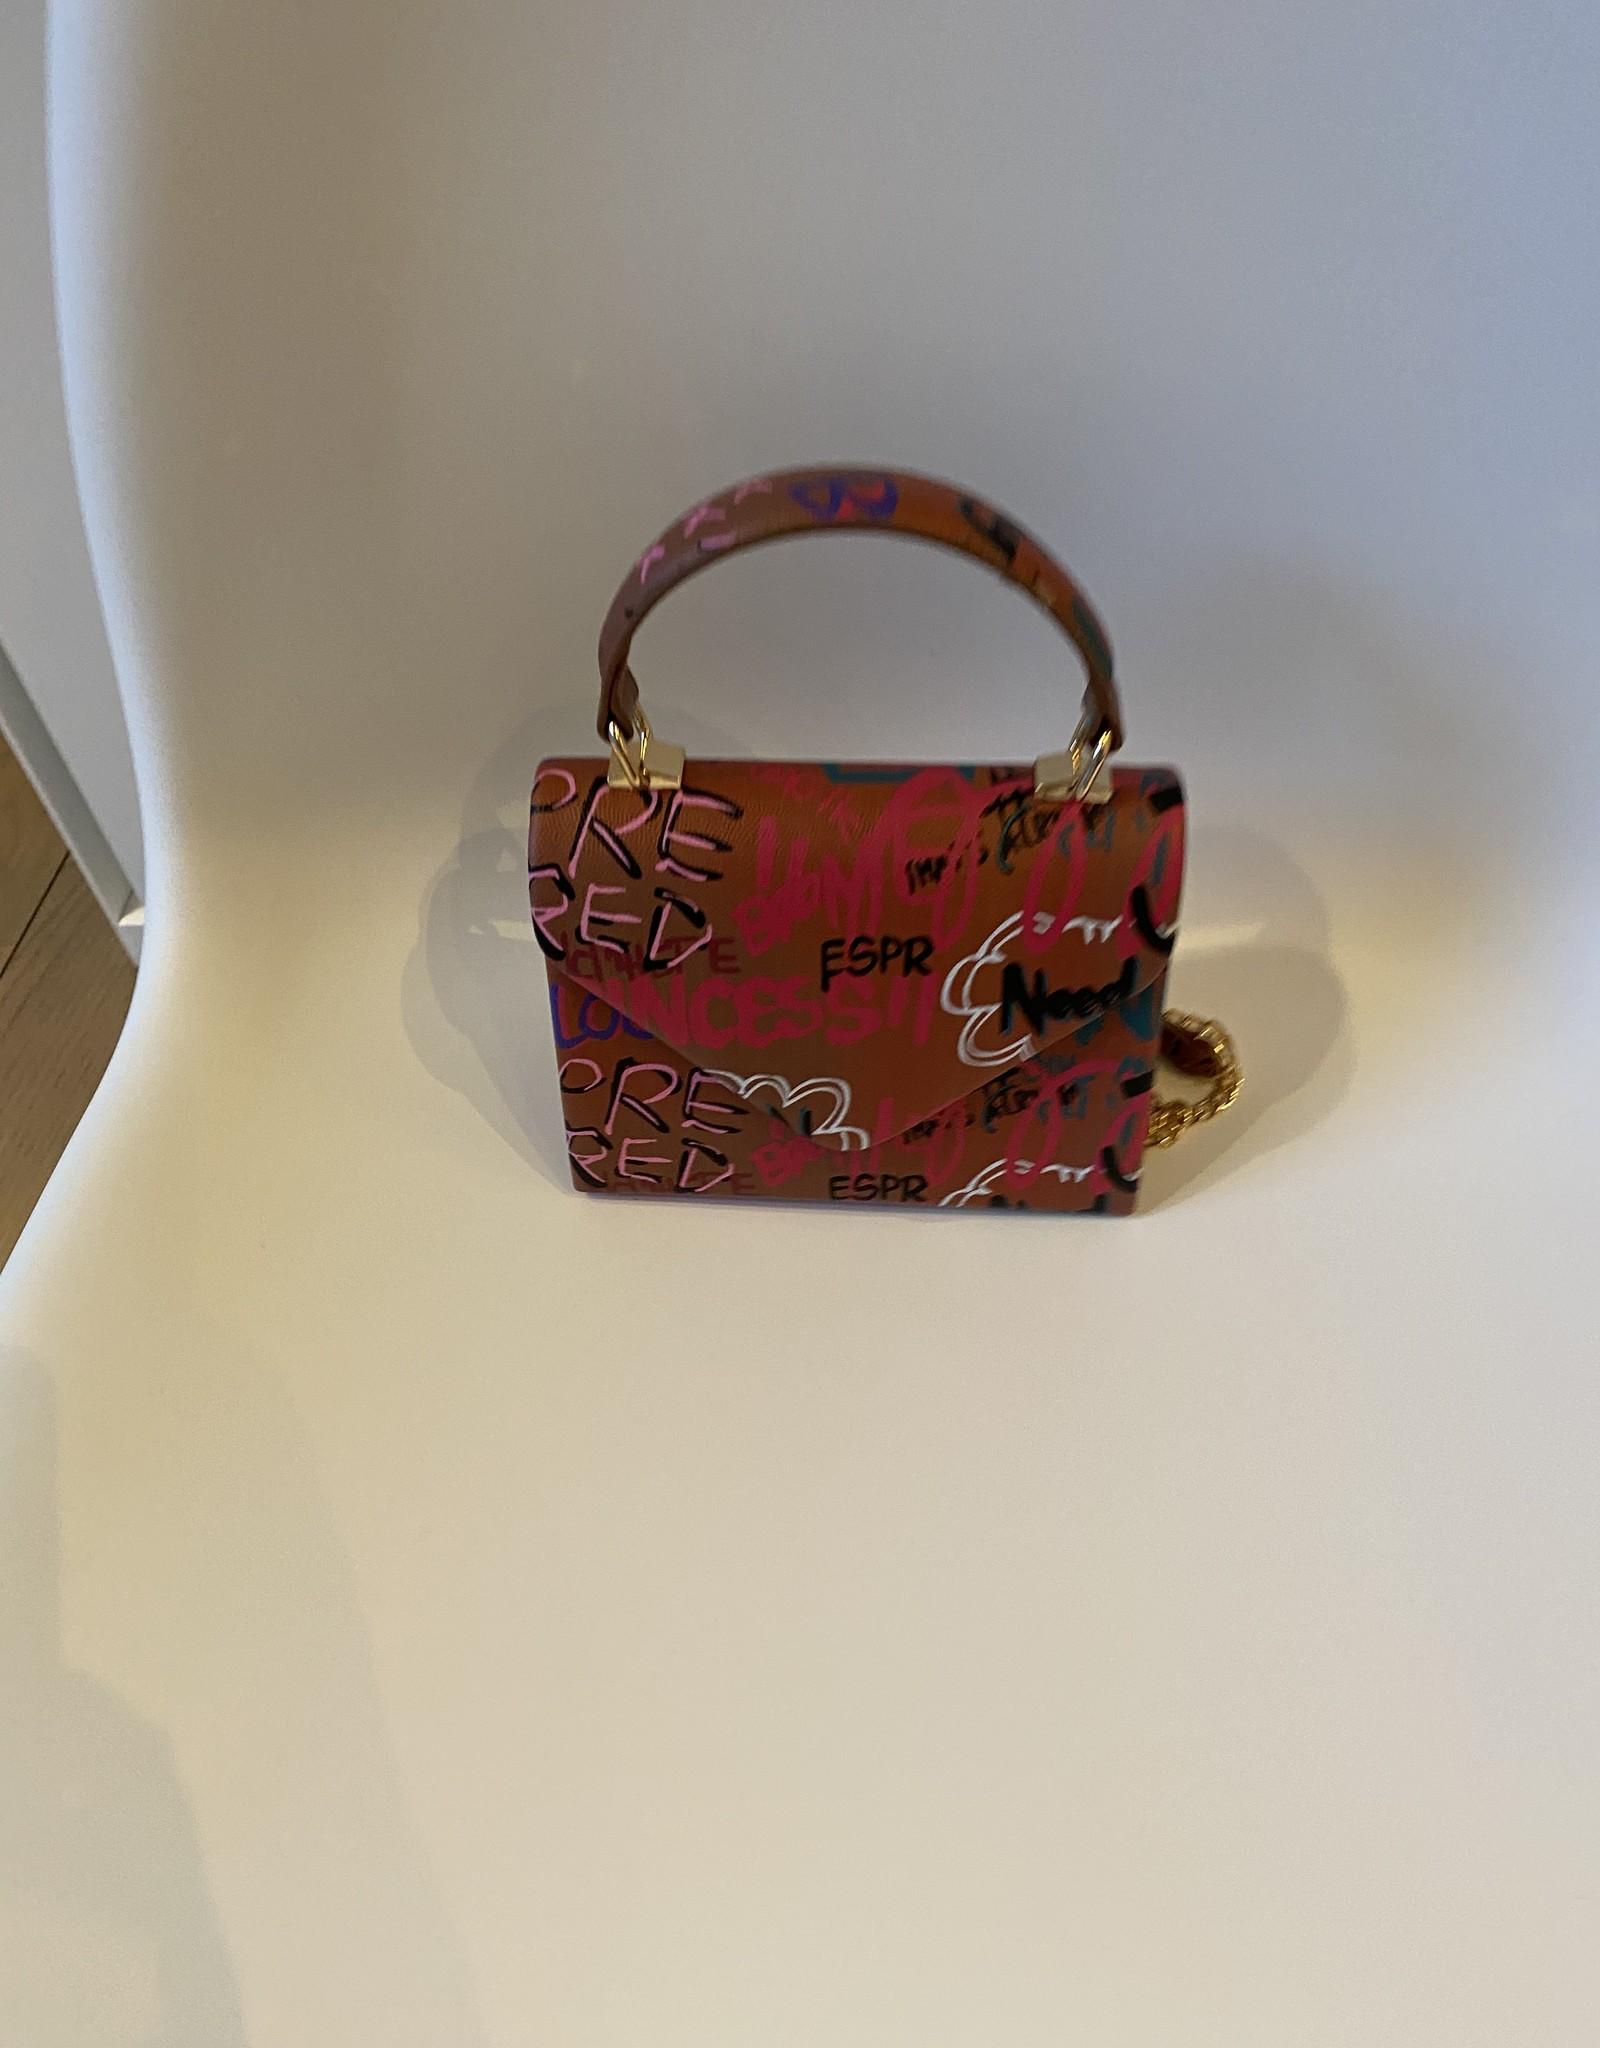 Fantasy bag with graffiti and long shoulderbelt and handle